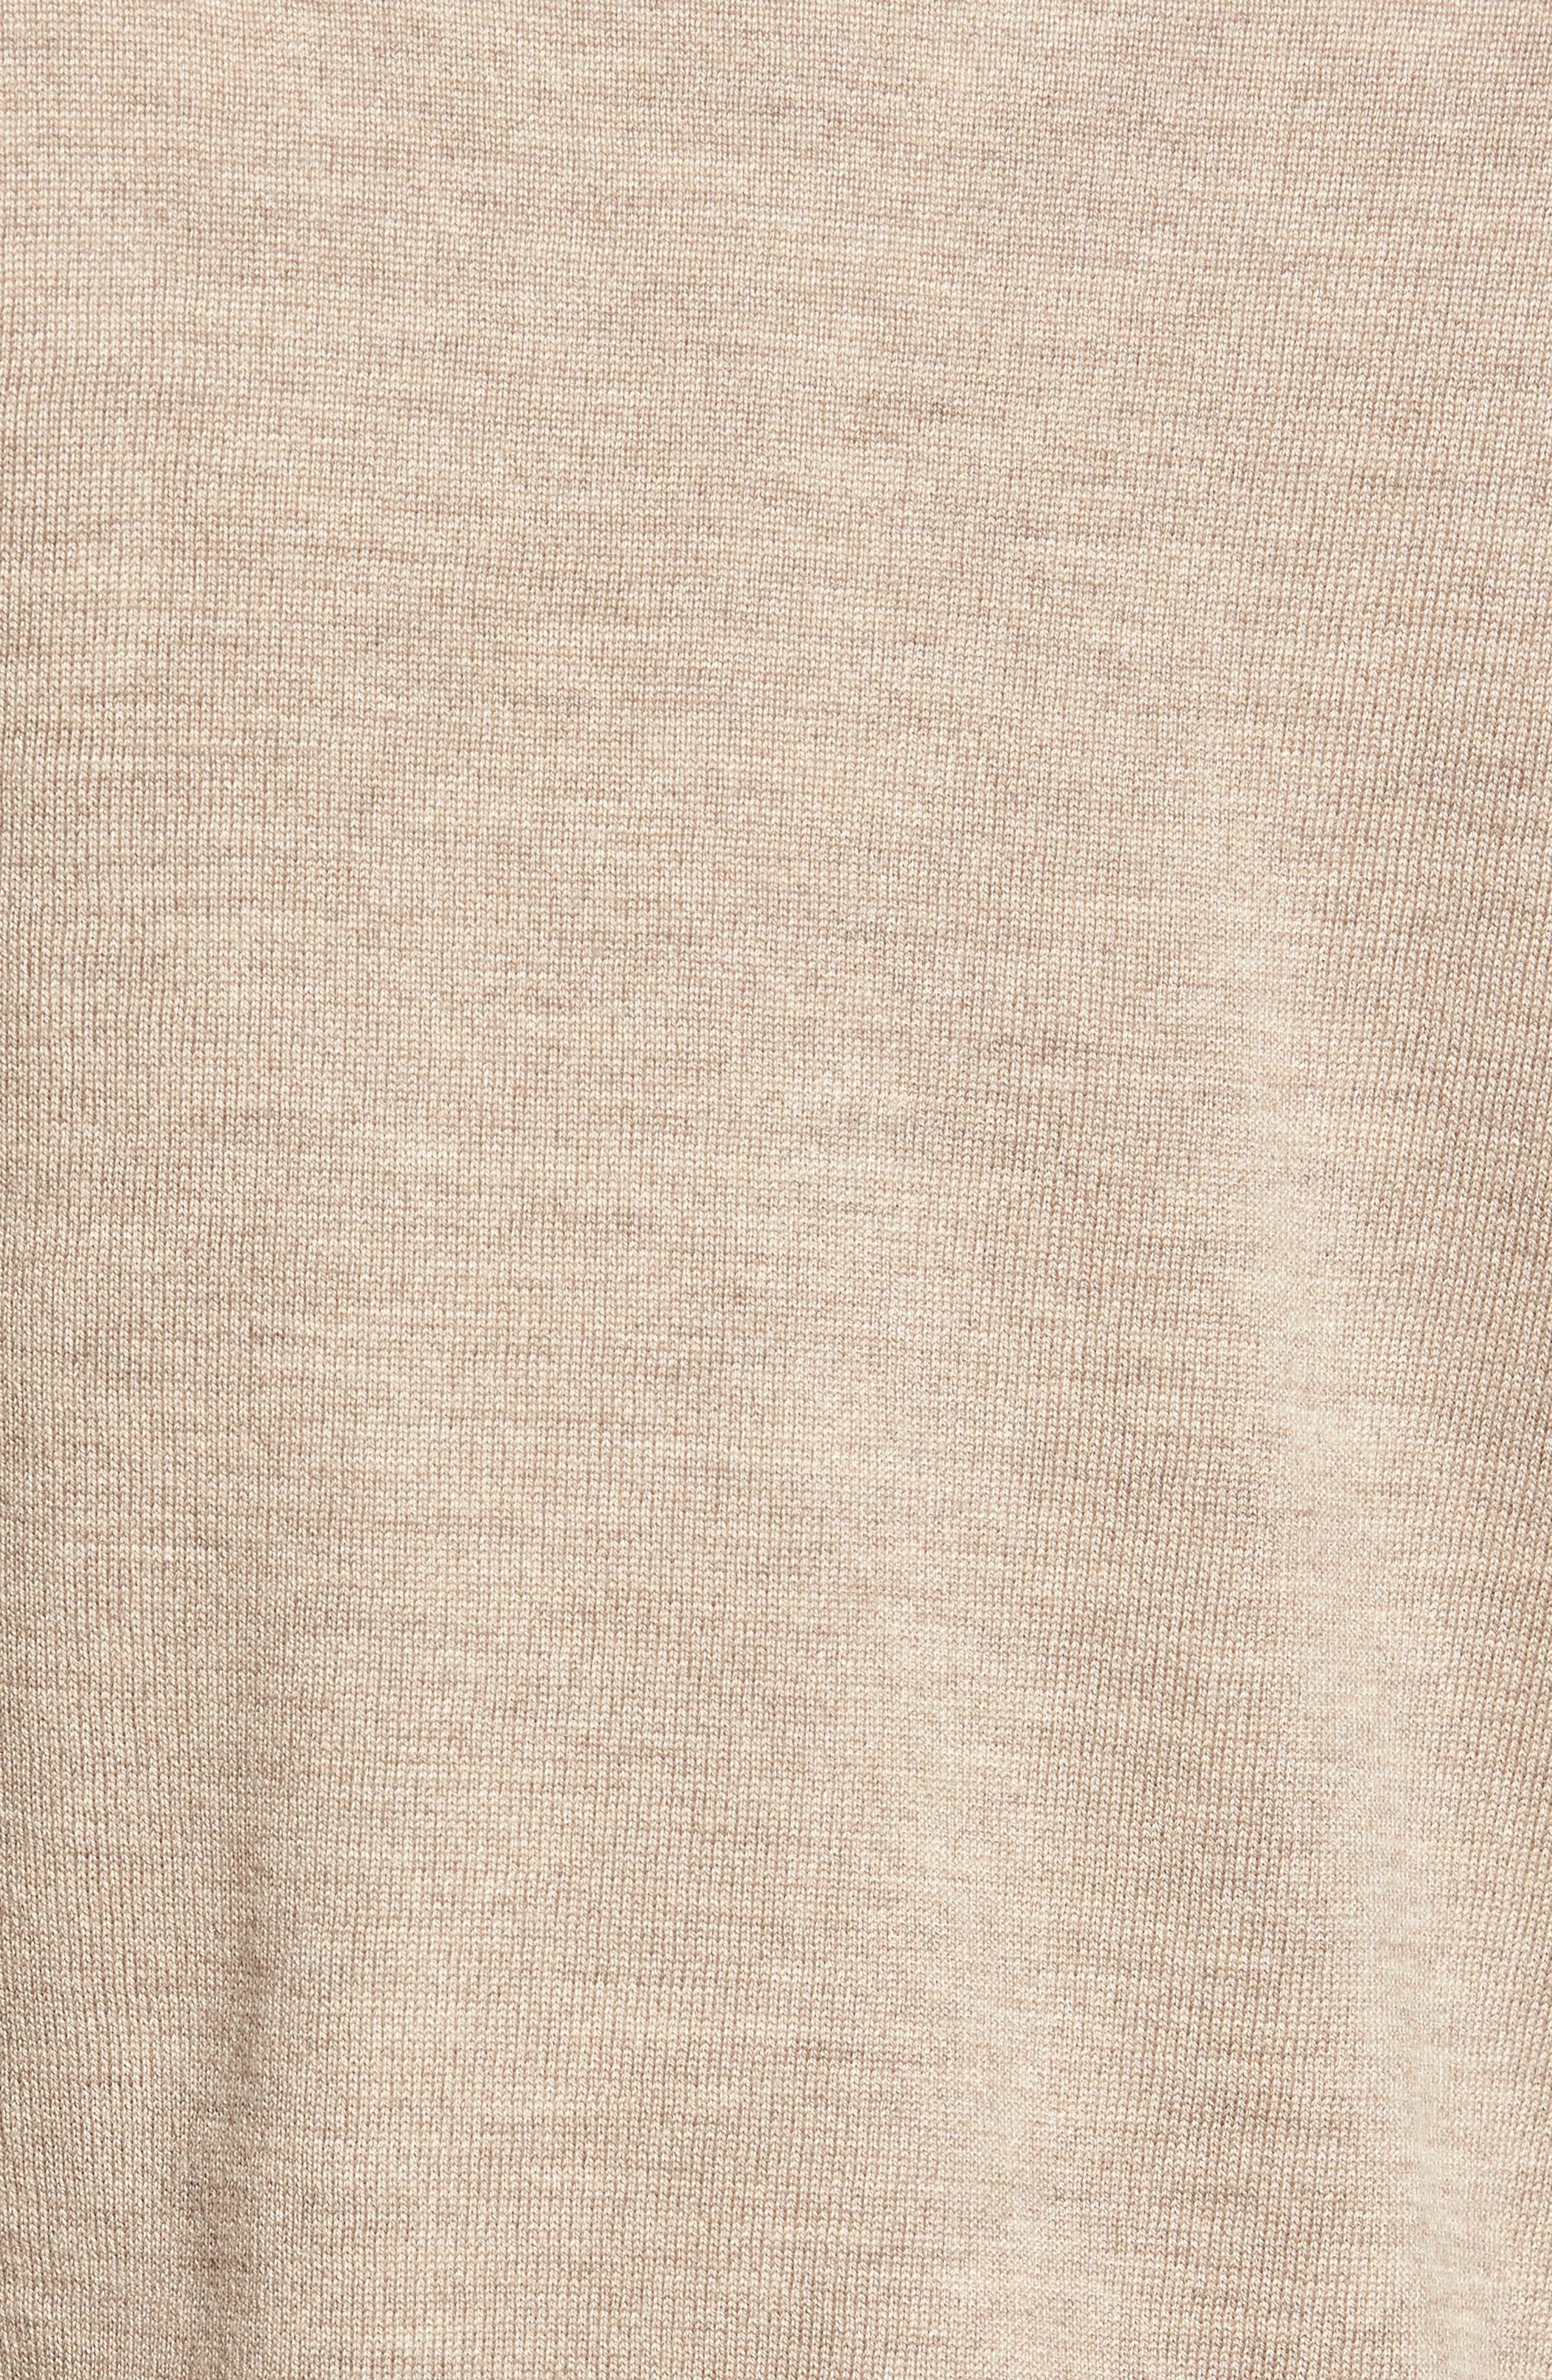 Merino Sweater,                             Alternate thumbnail 5, color,                             Astro